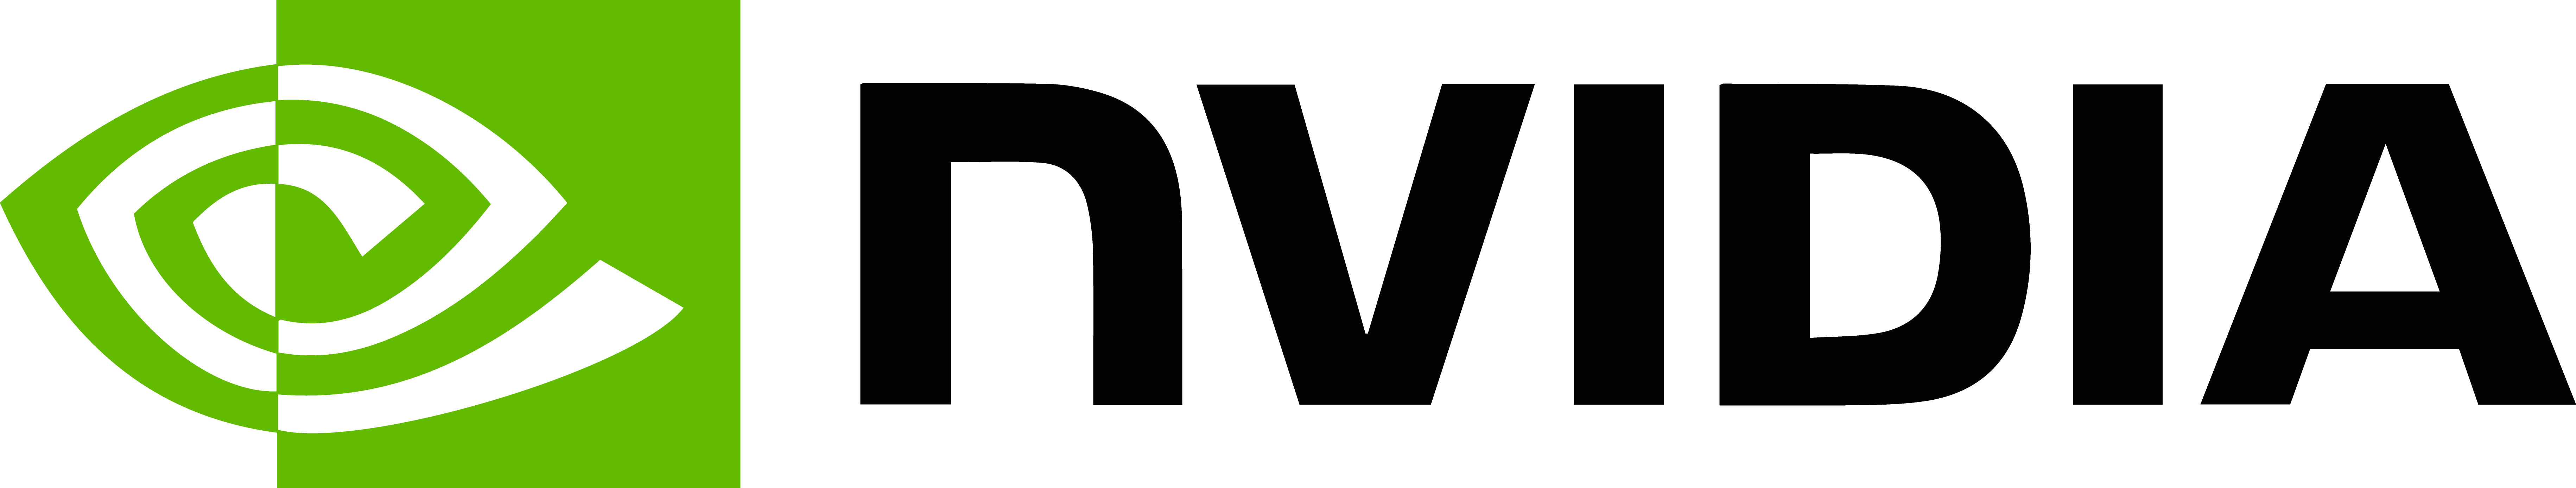 Nvidia PNG - 106226